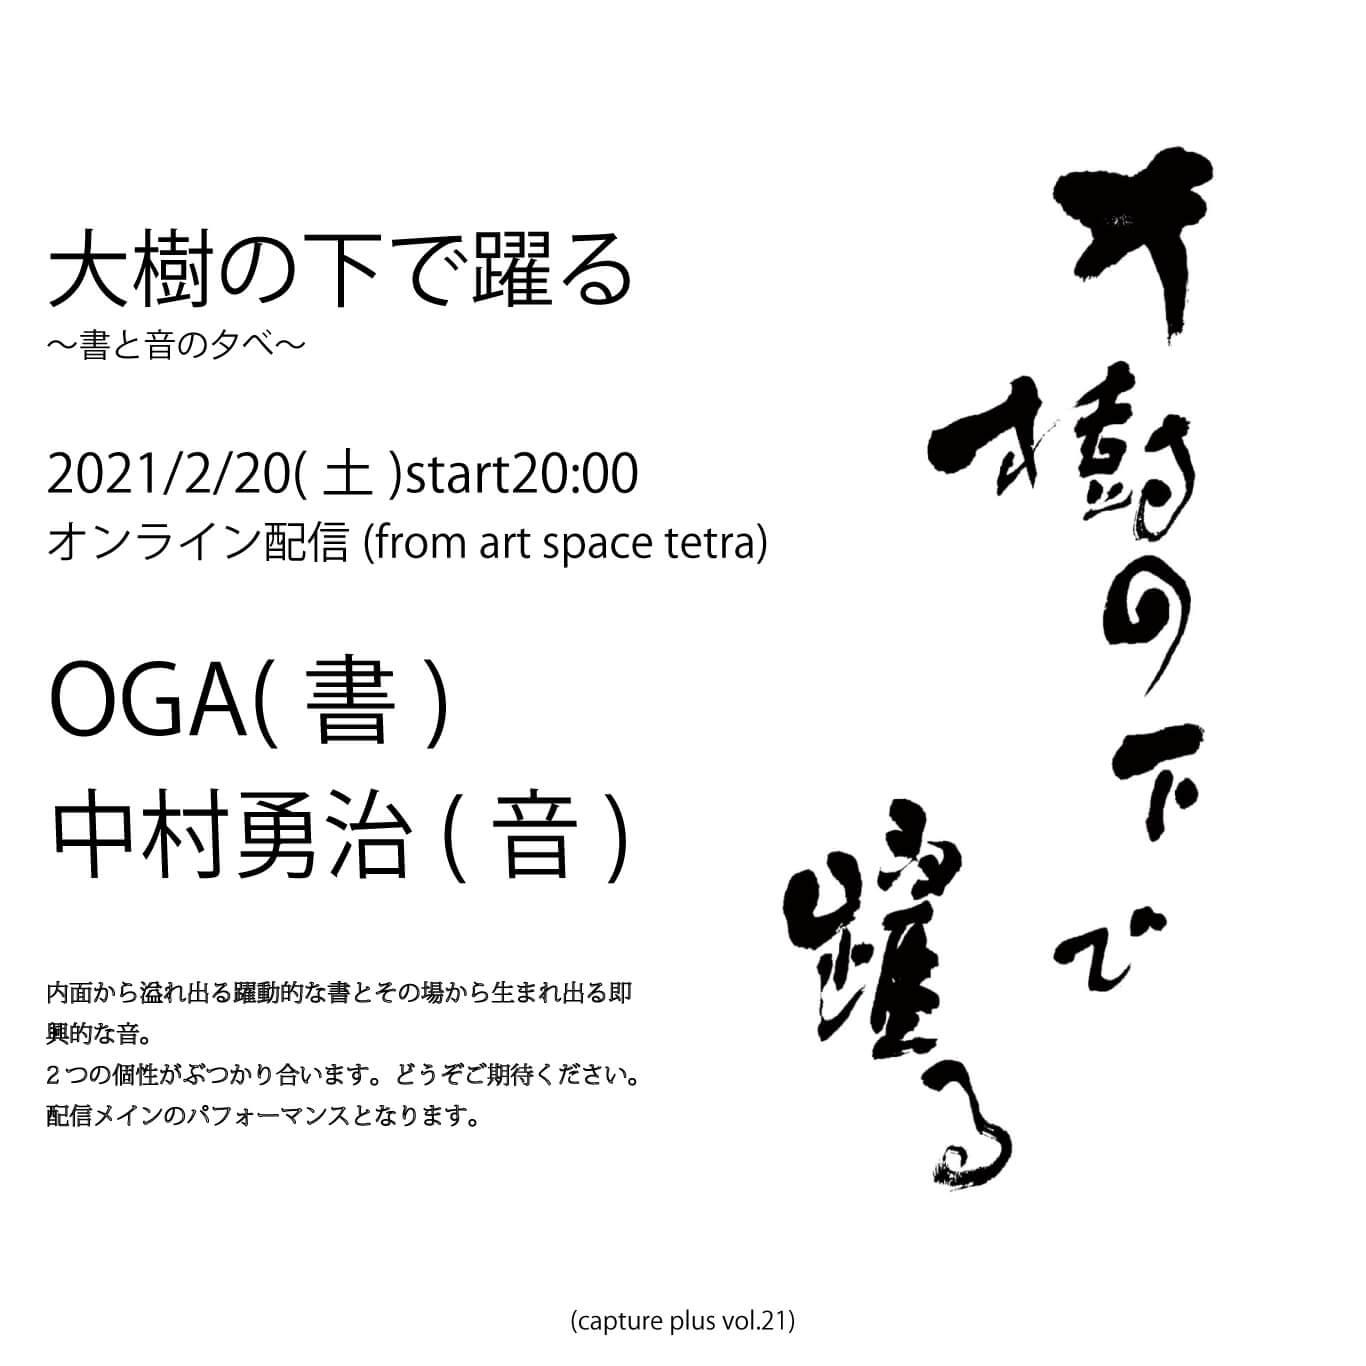 tetra-202102-大樹の下で躍る 〜書と音の夕べ〜(capture plus vol.21)